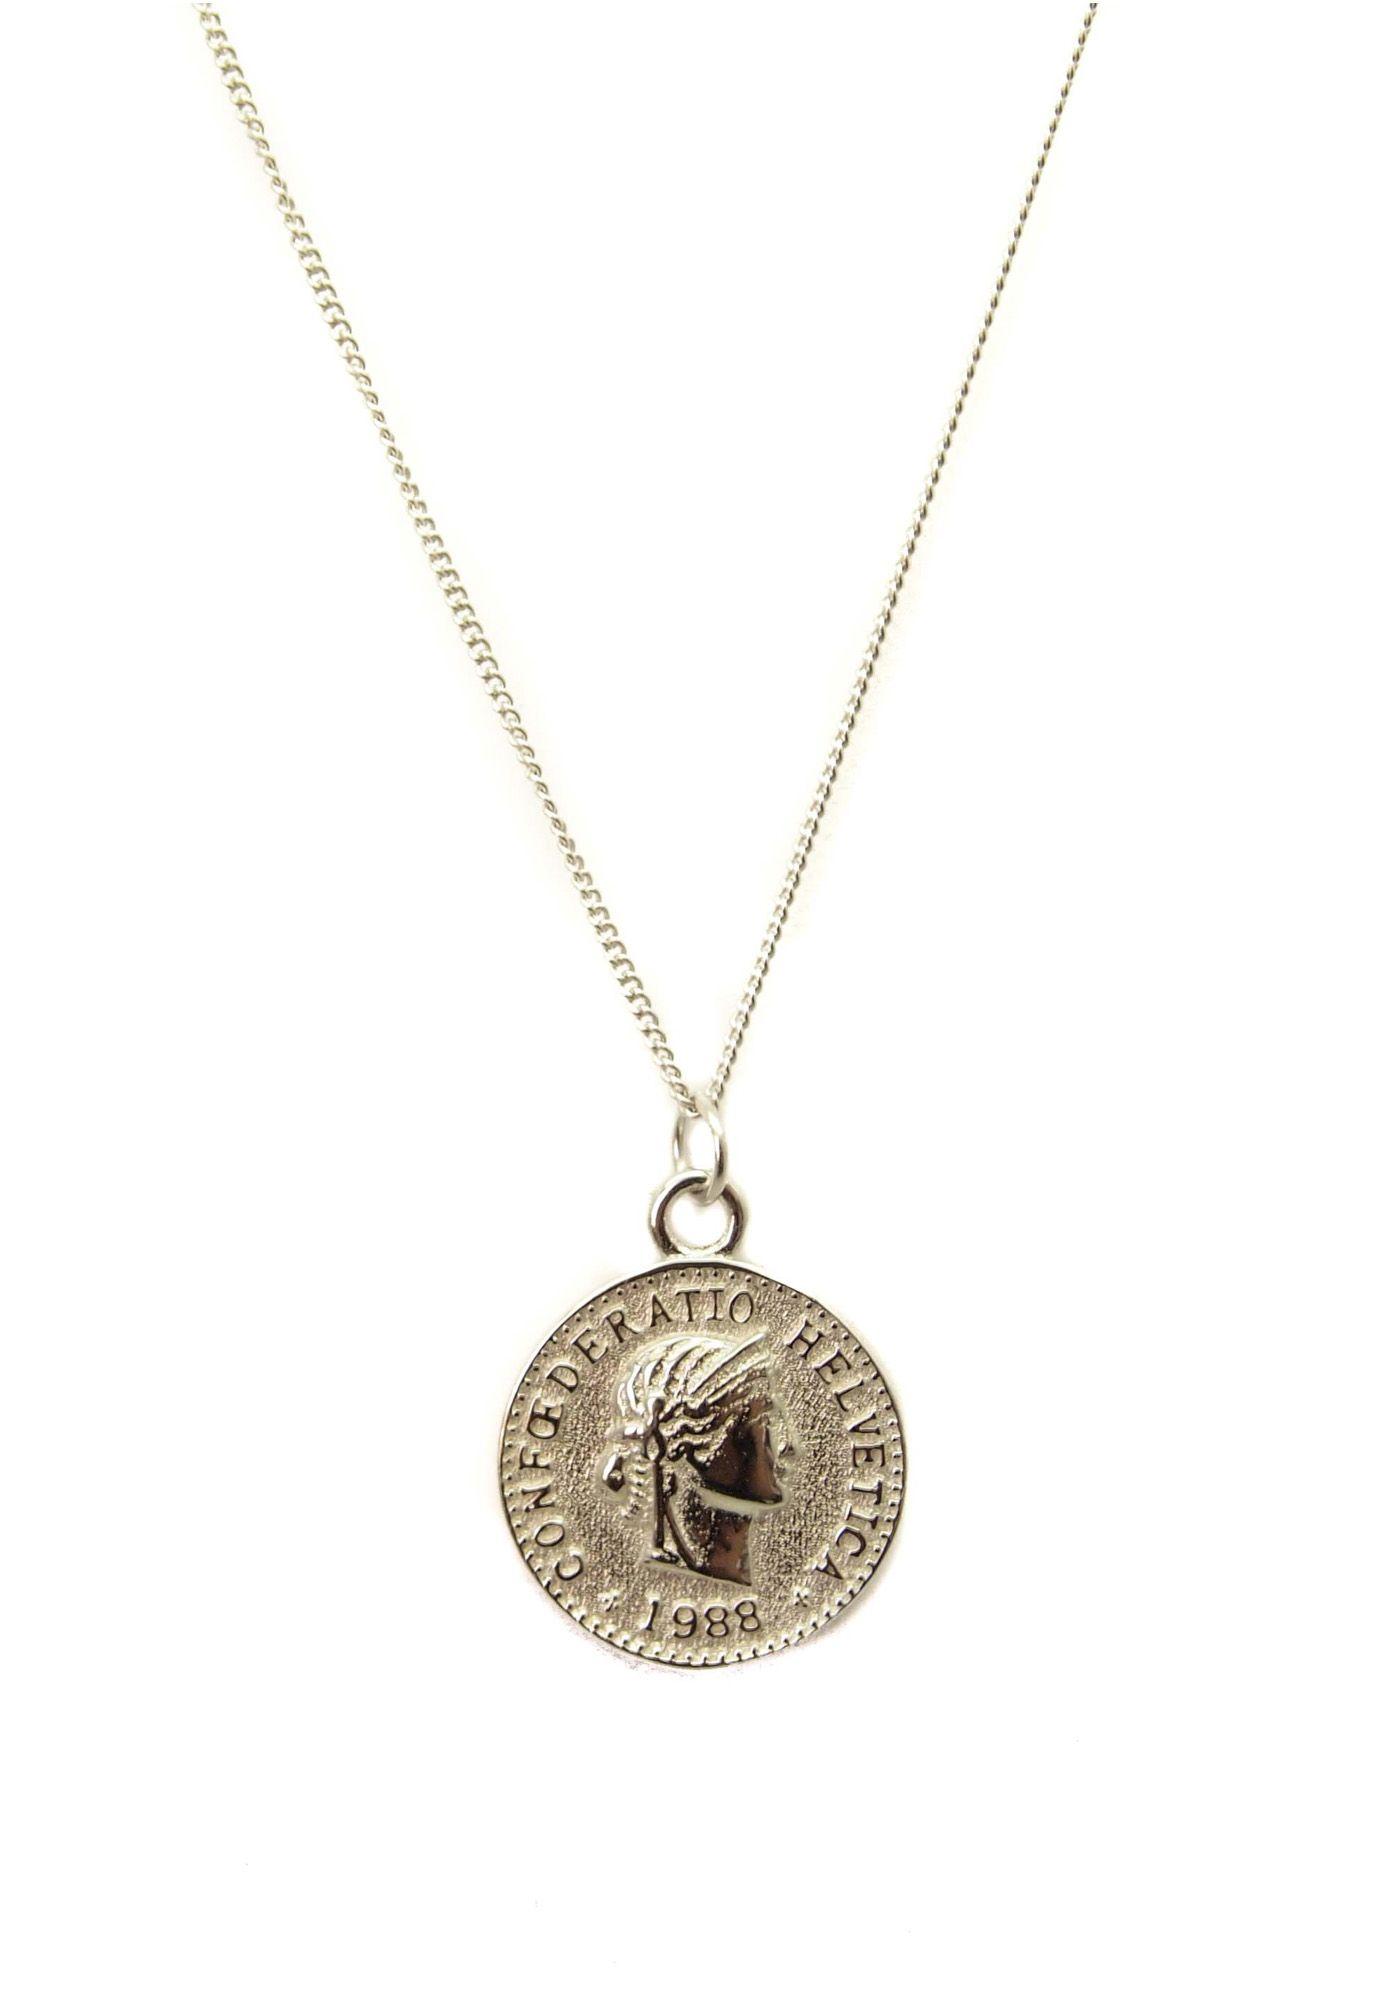 Medalla Helvetica - Musa Accesorios